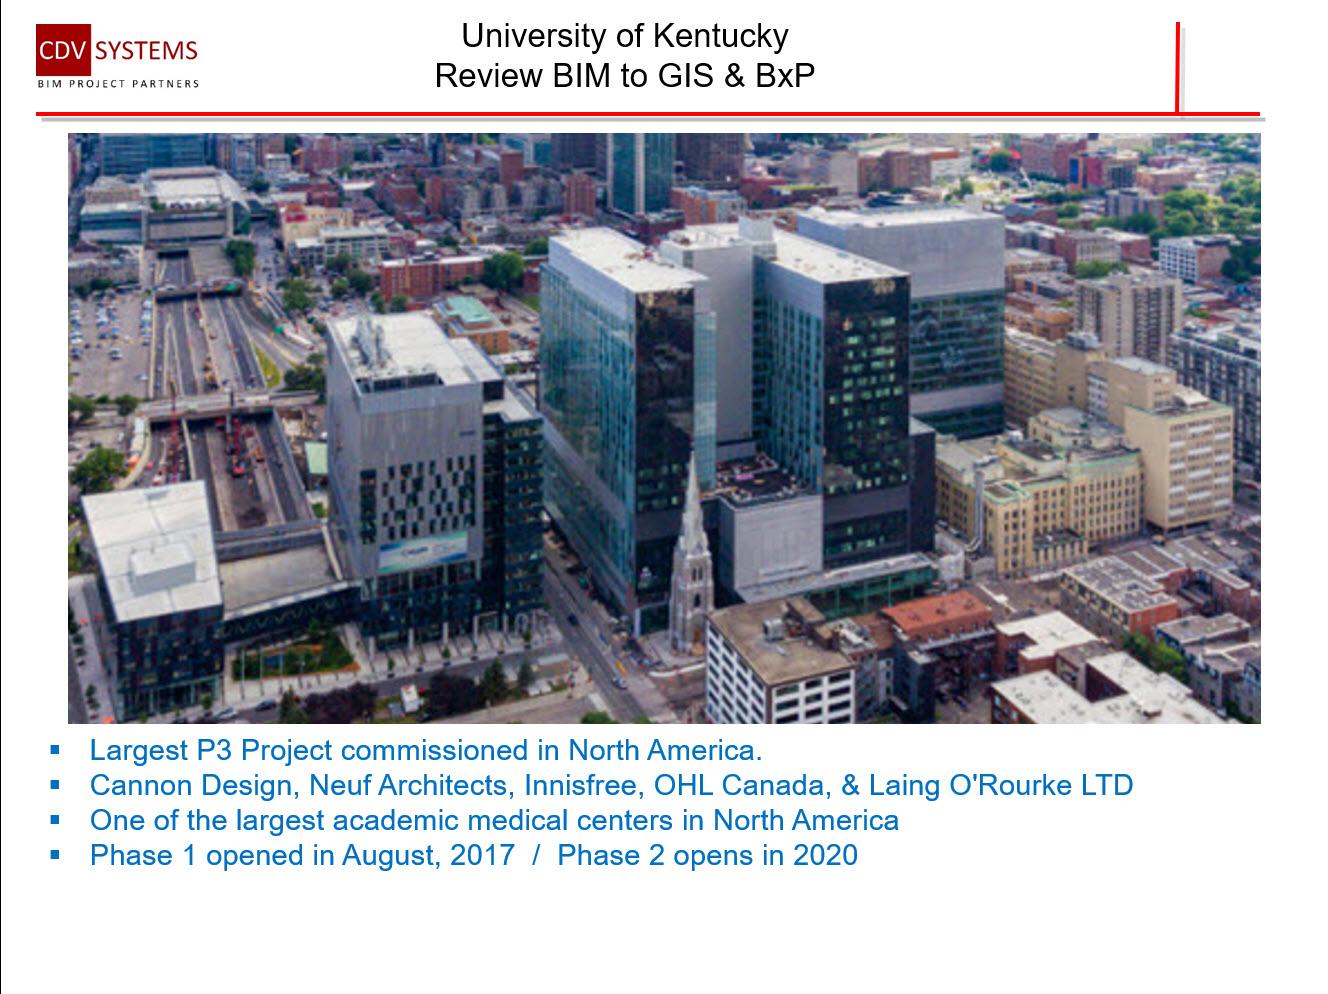 University of Kentucky_001r.jpg